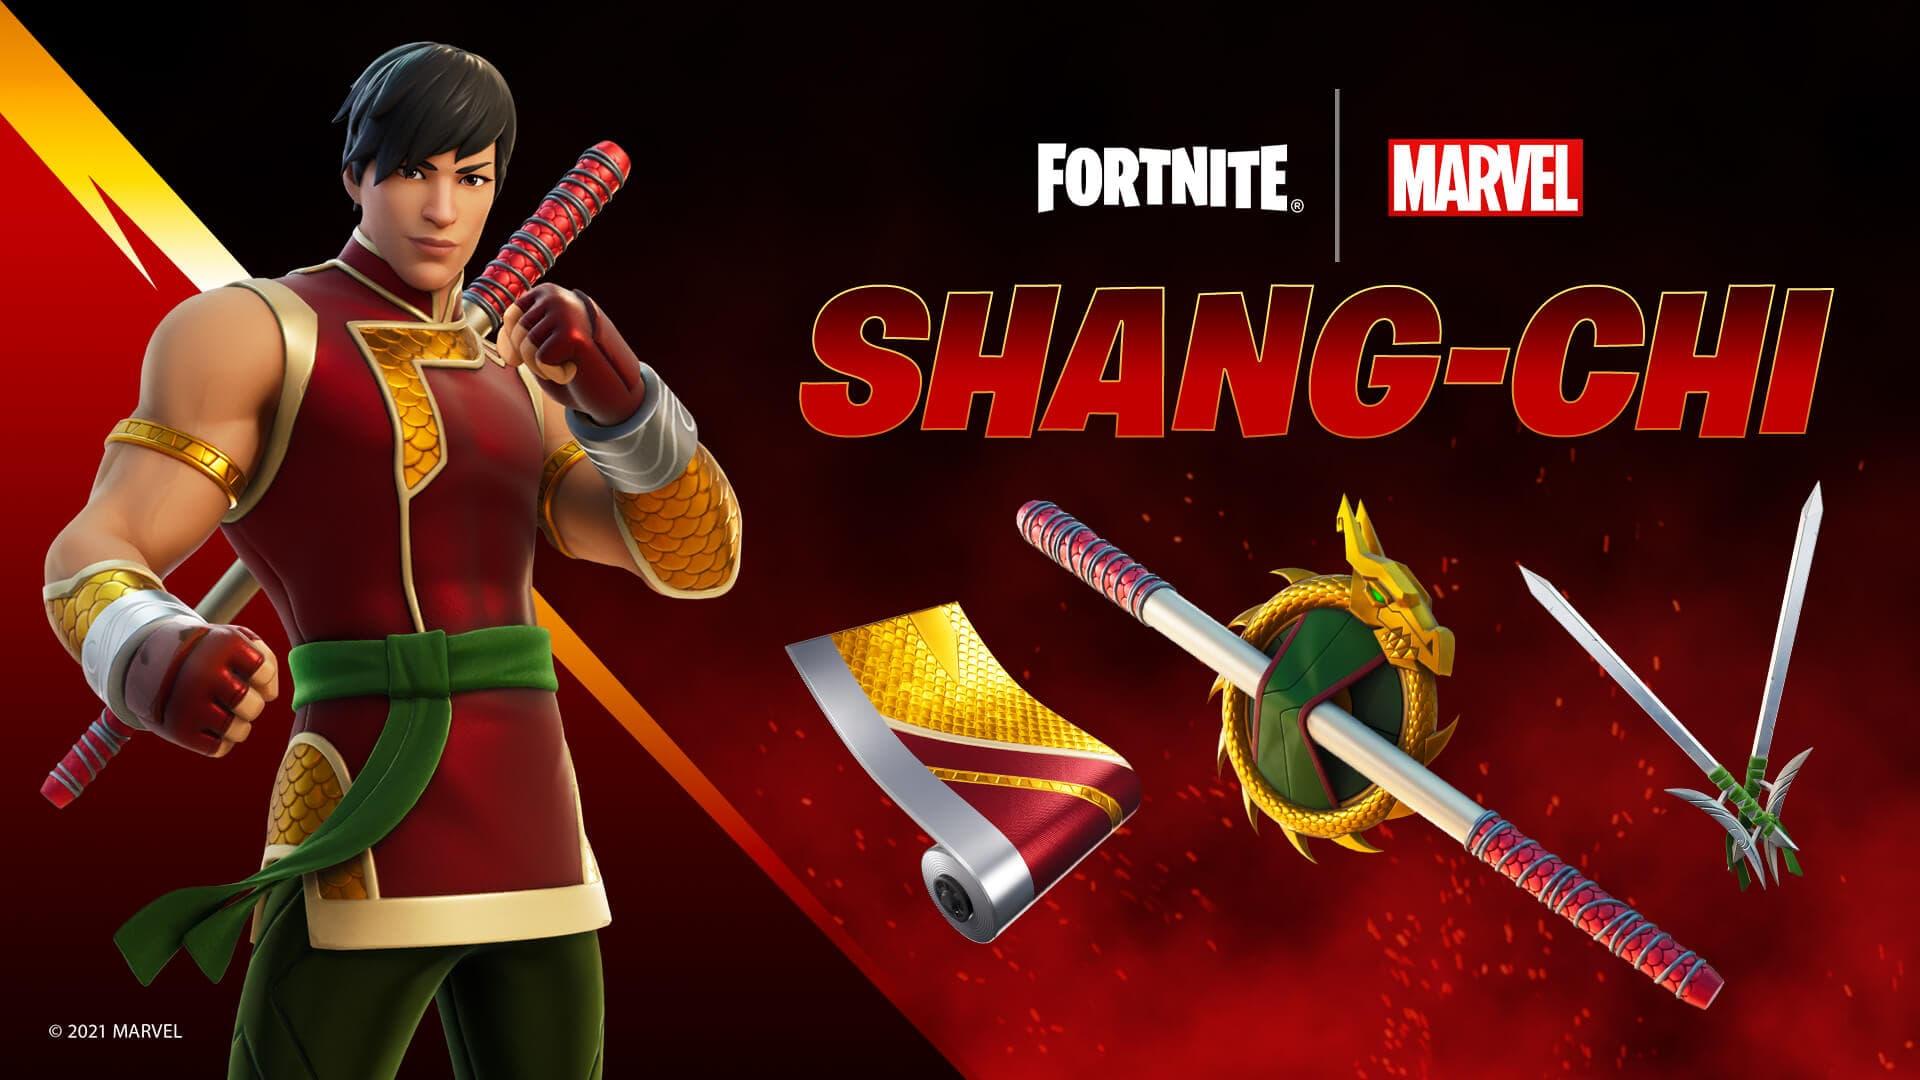 Así es la skin de Shang-Chi de Marvel en Fortnite | Kyaooo